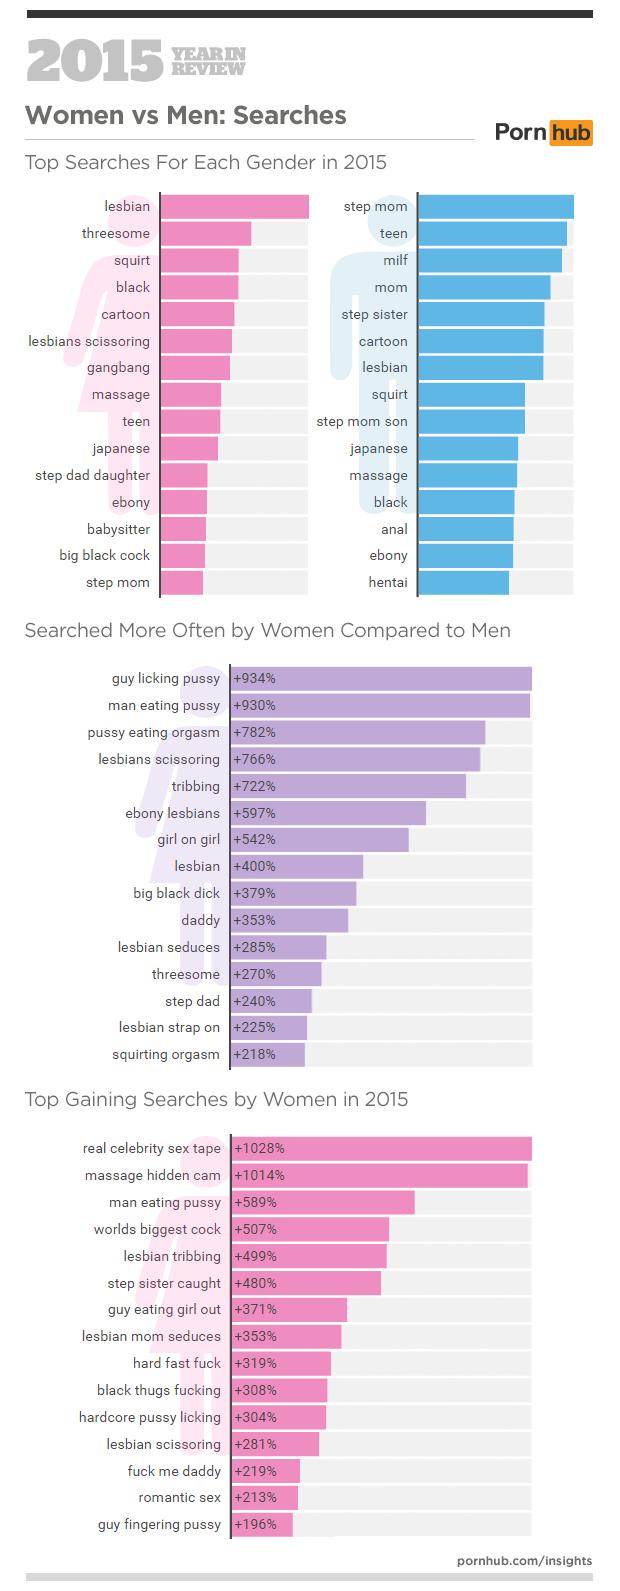 pornhub's 2015 year in review – pornhub insights